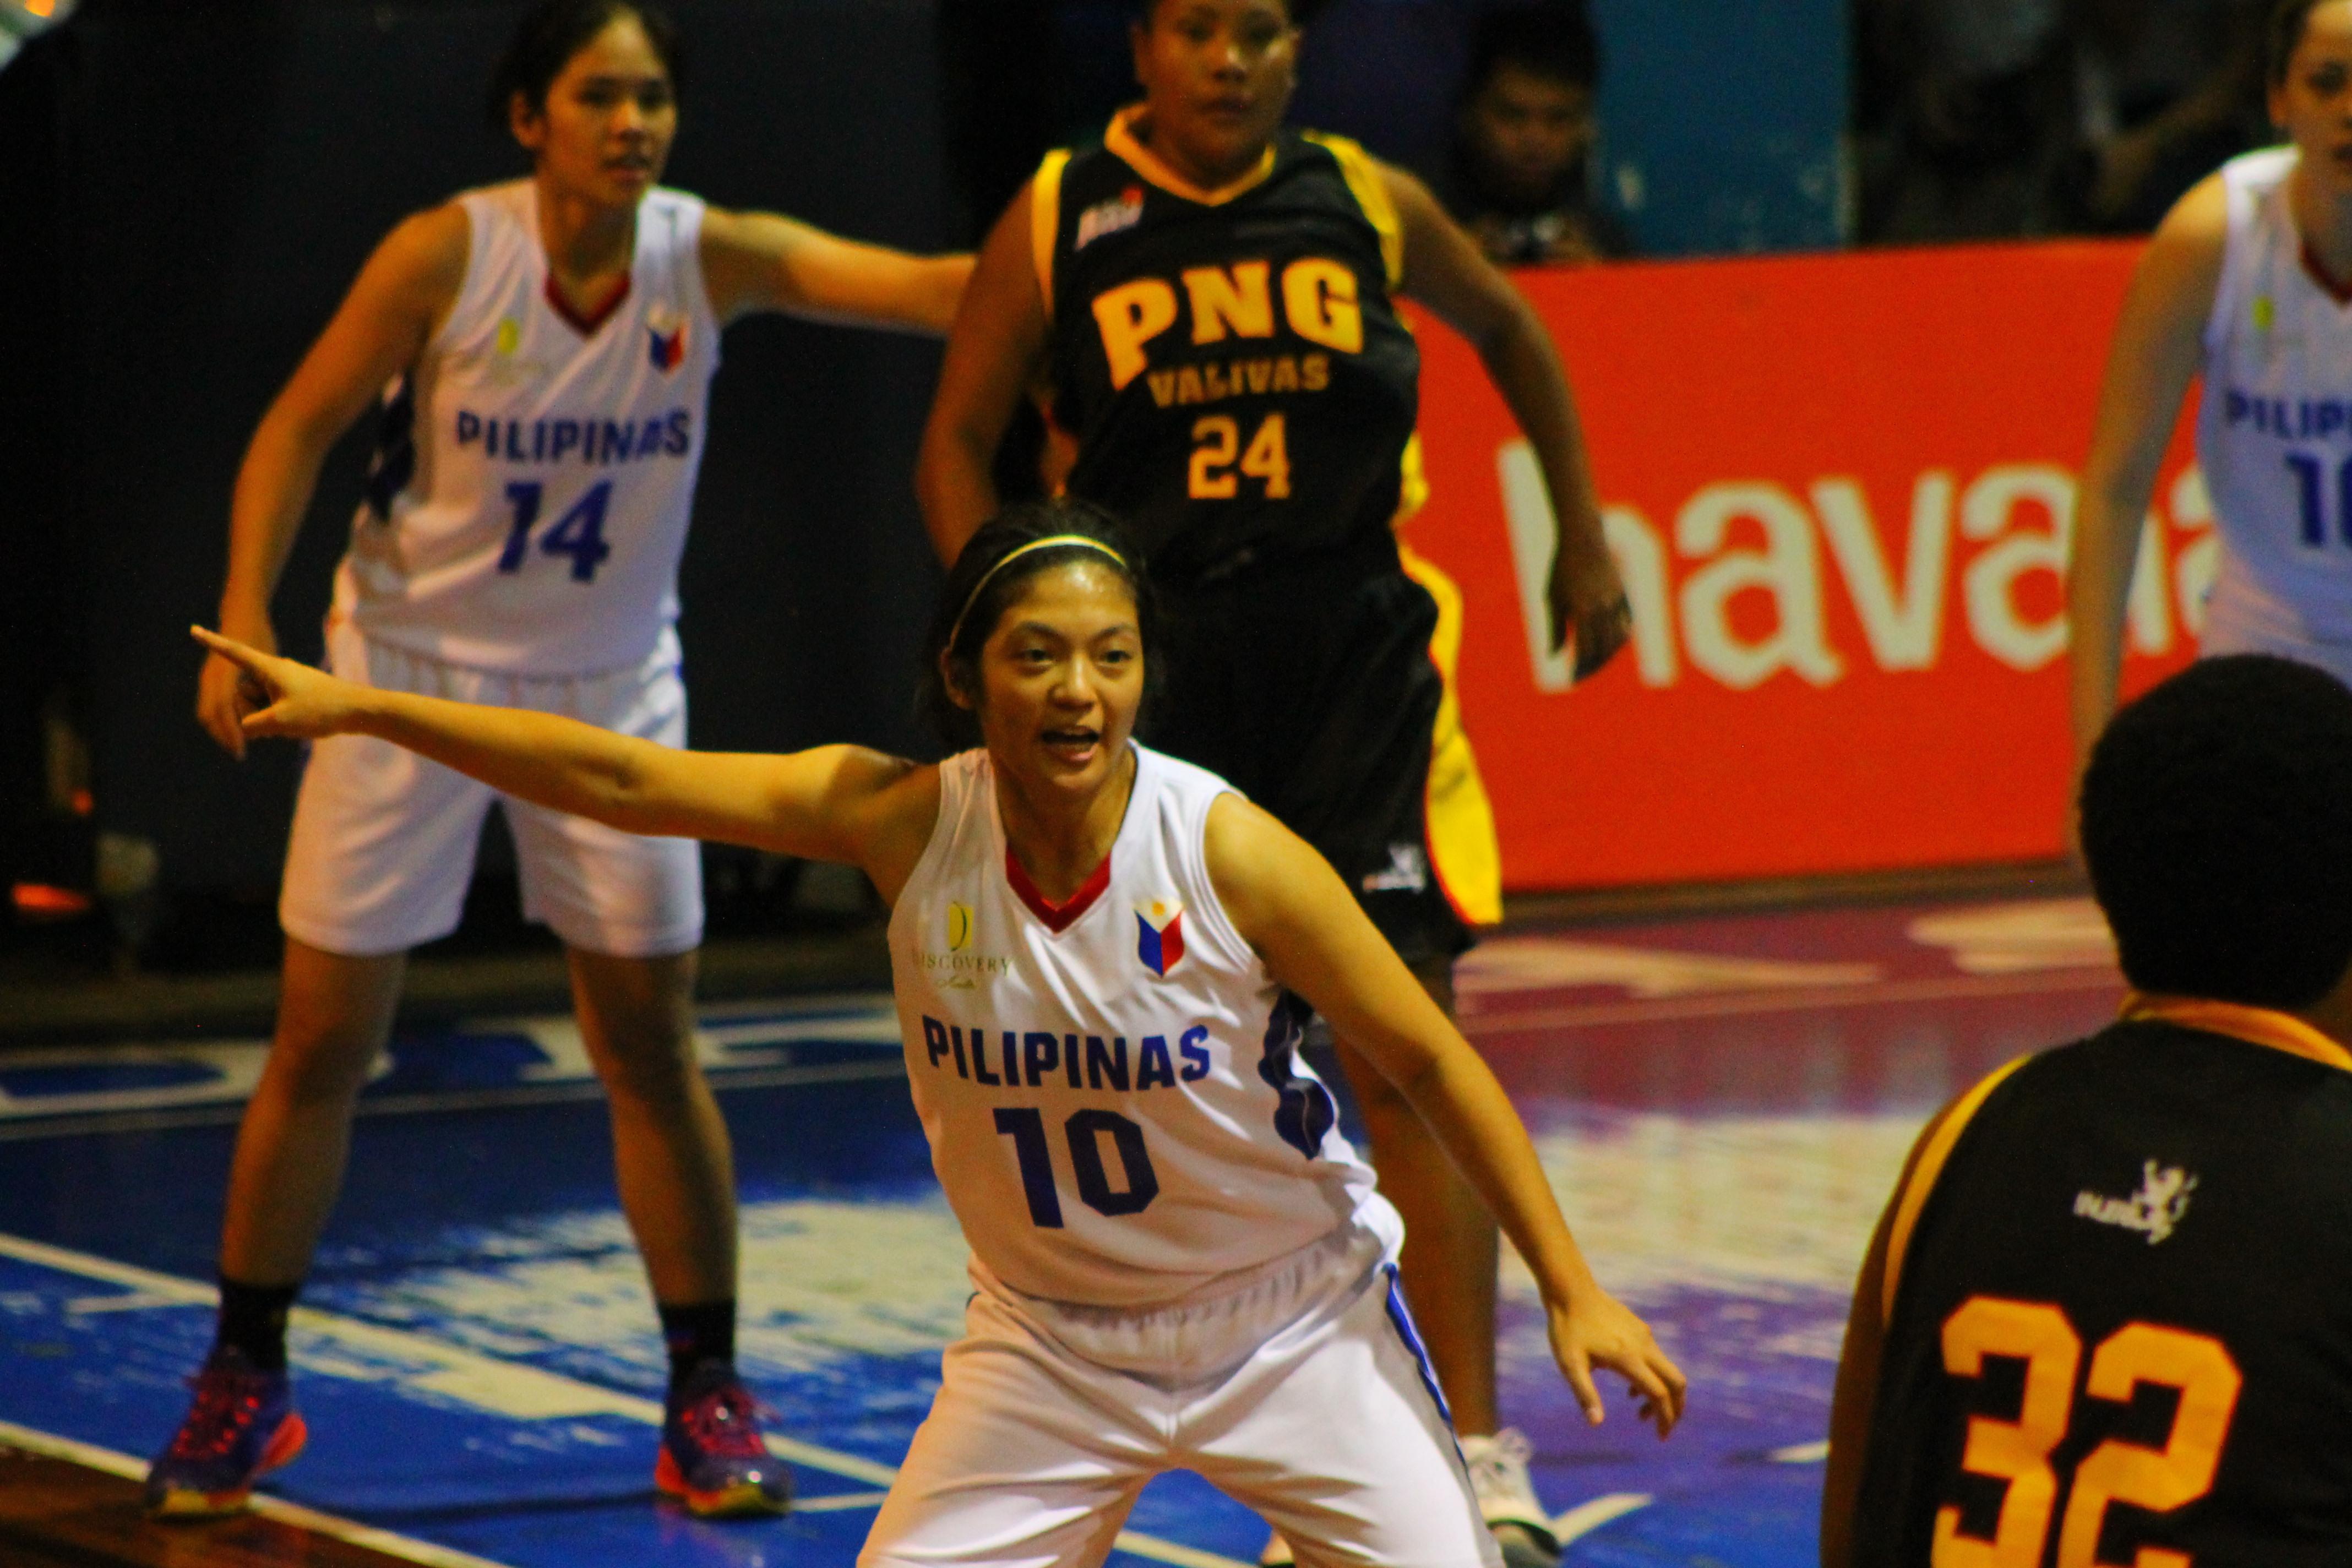 The 3rd Discovery International Women's Basketball Invitational 2015